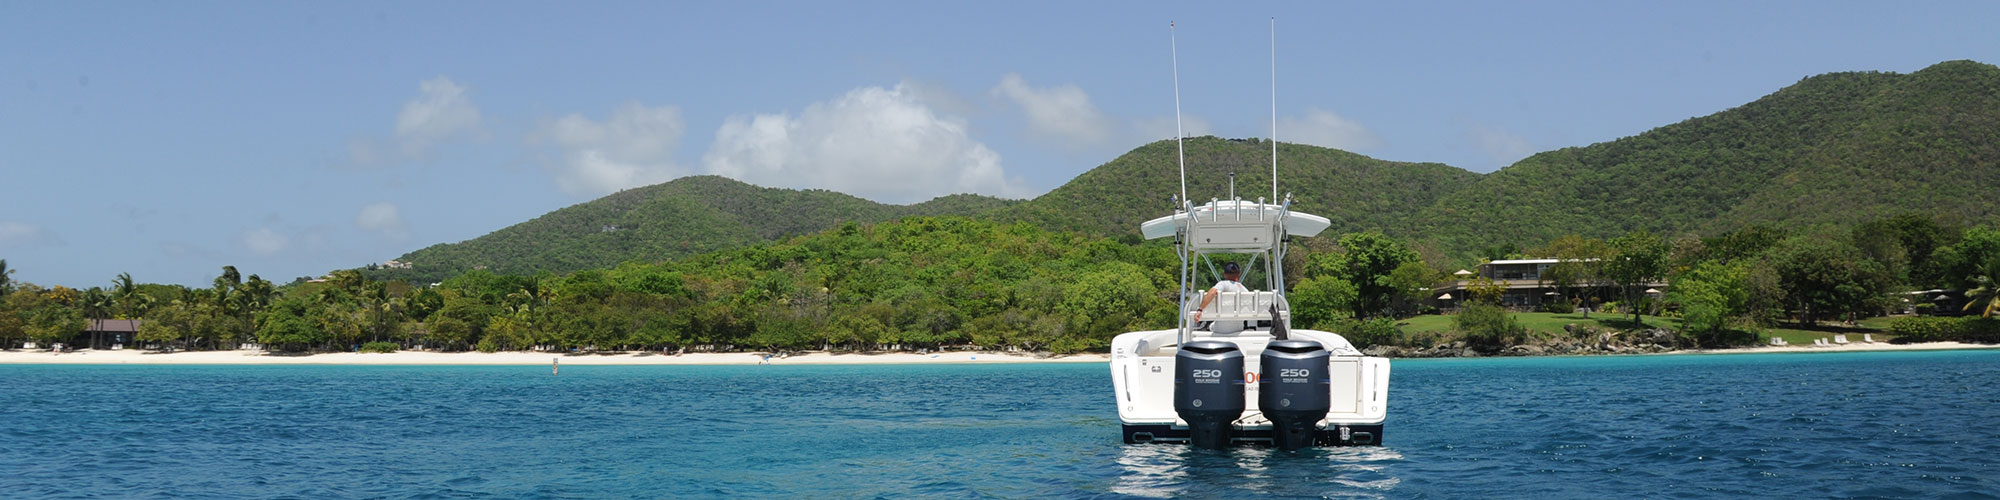 powerboat-charter-stjohn-usvi-2000x500